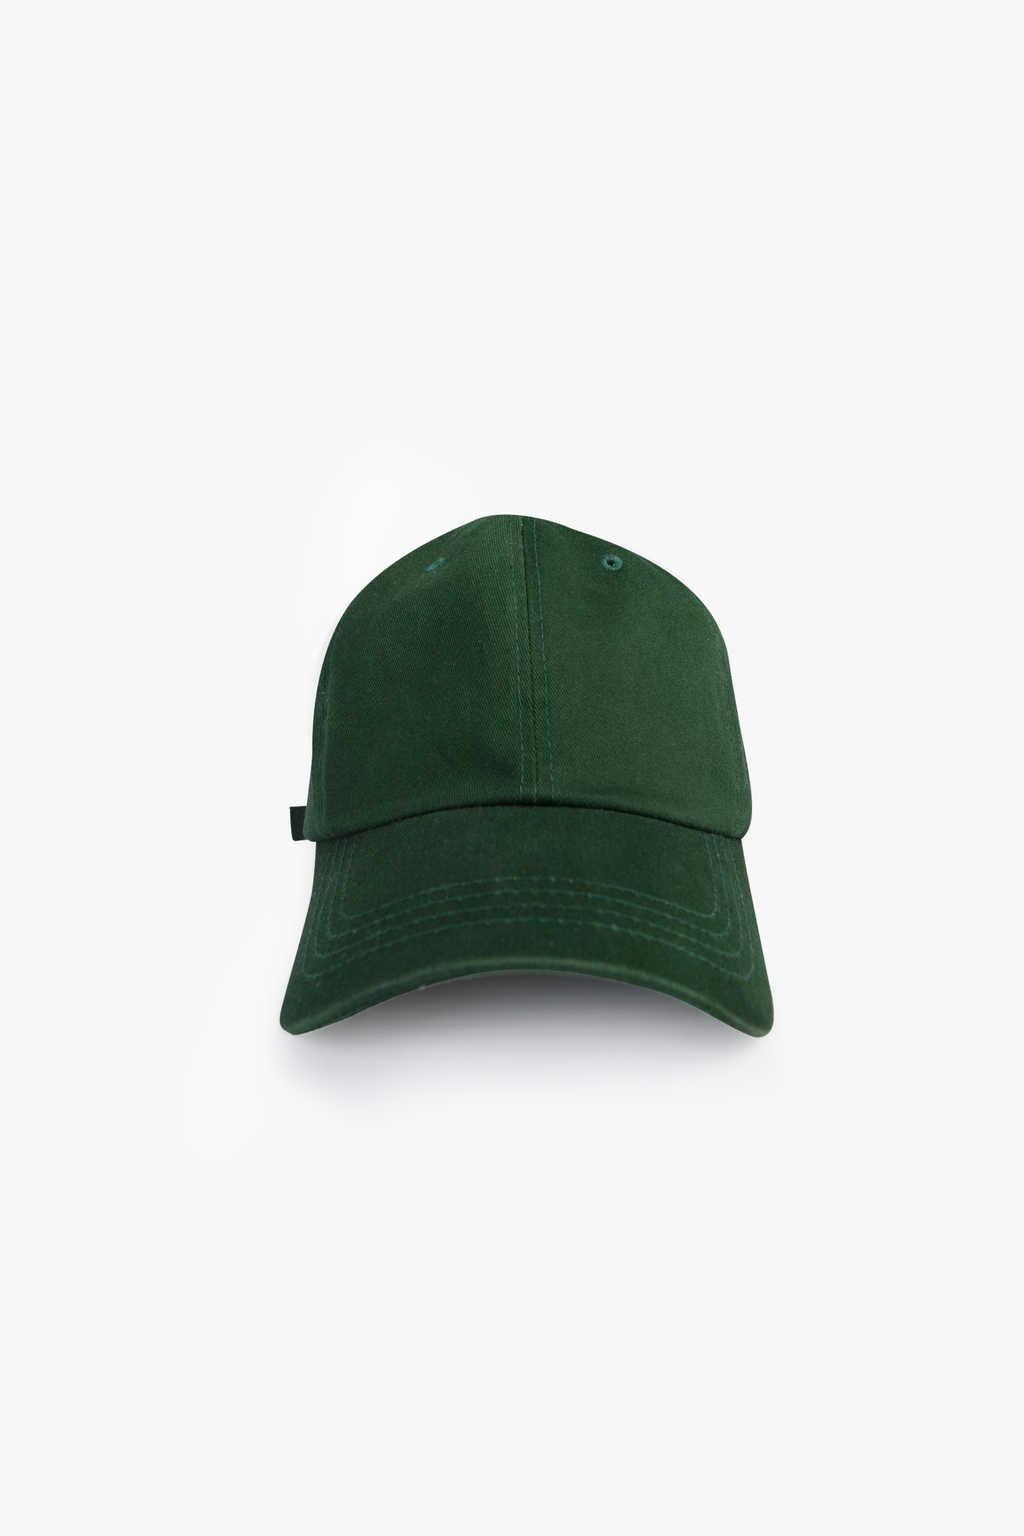 Hat H030 Green 4